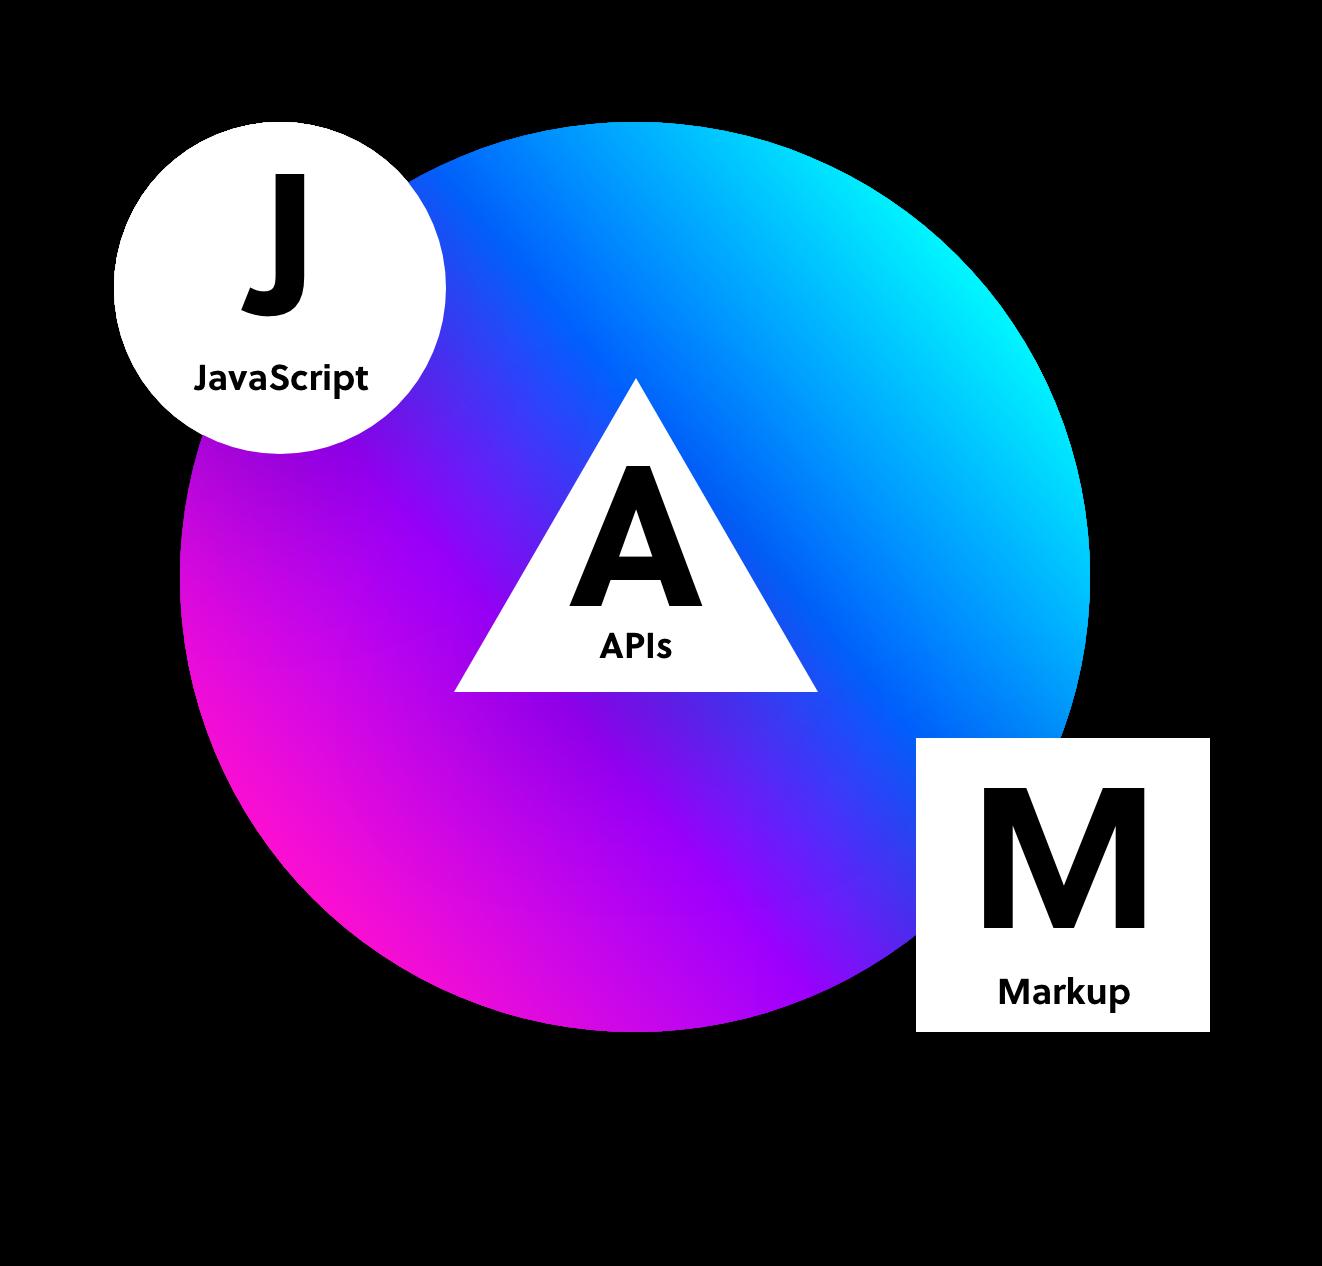 JAMstack-illustrated